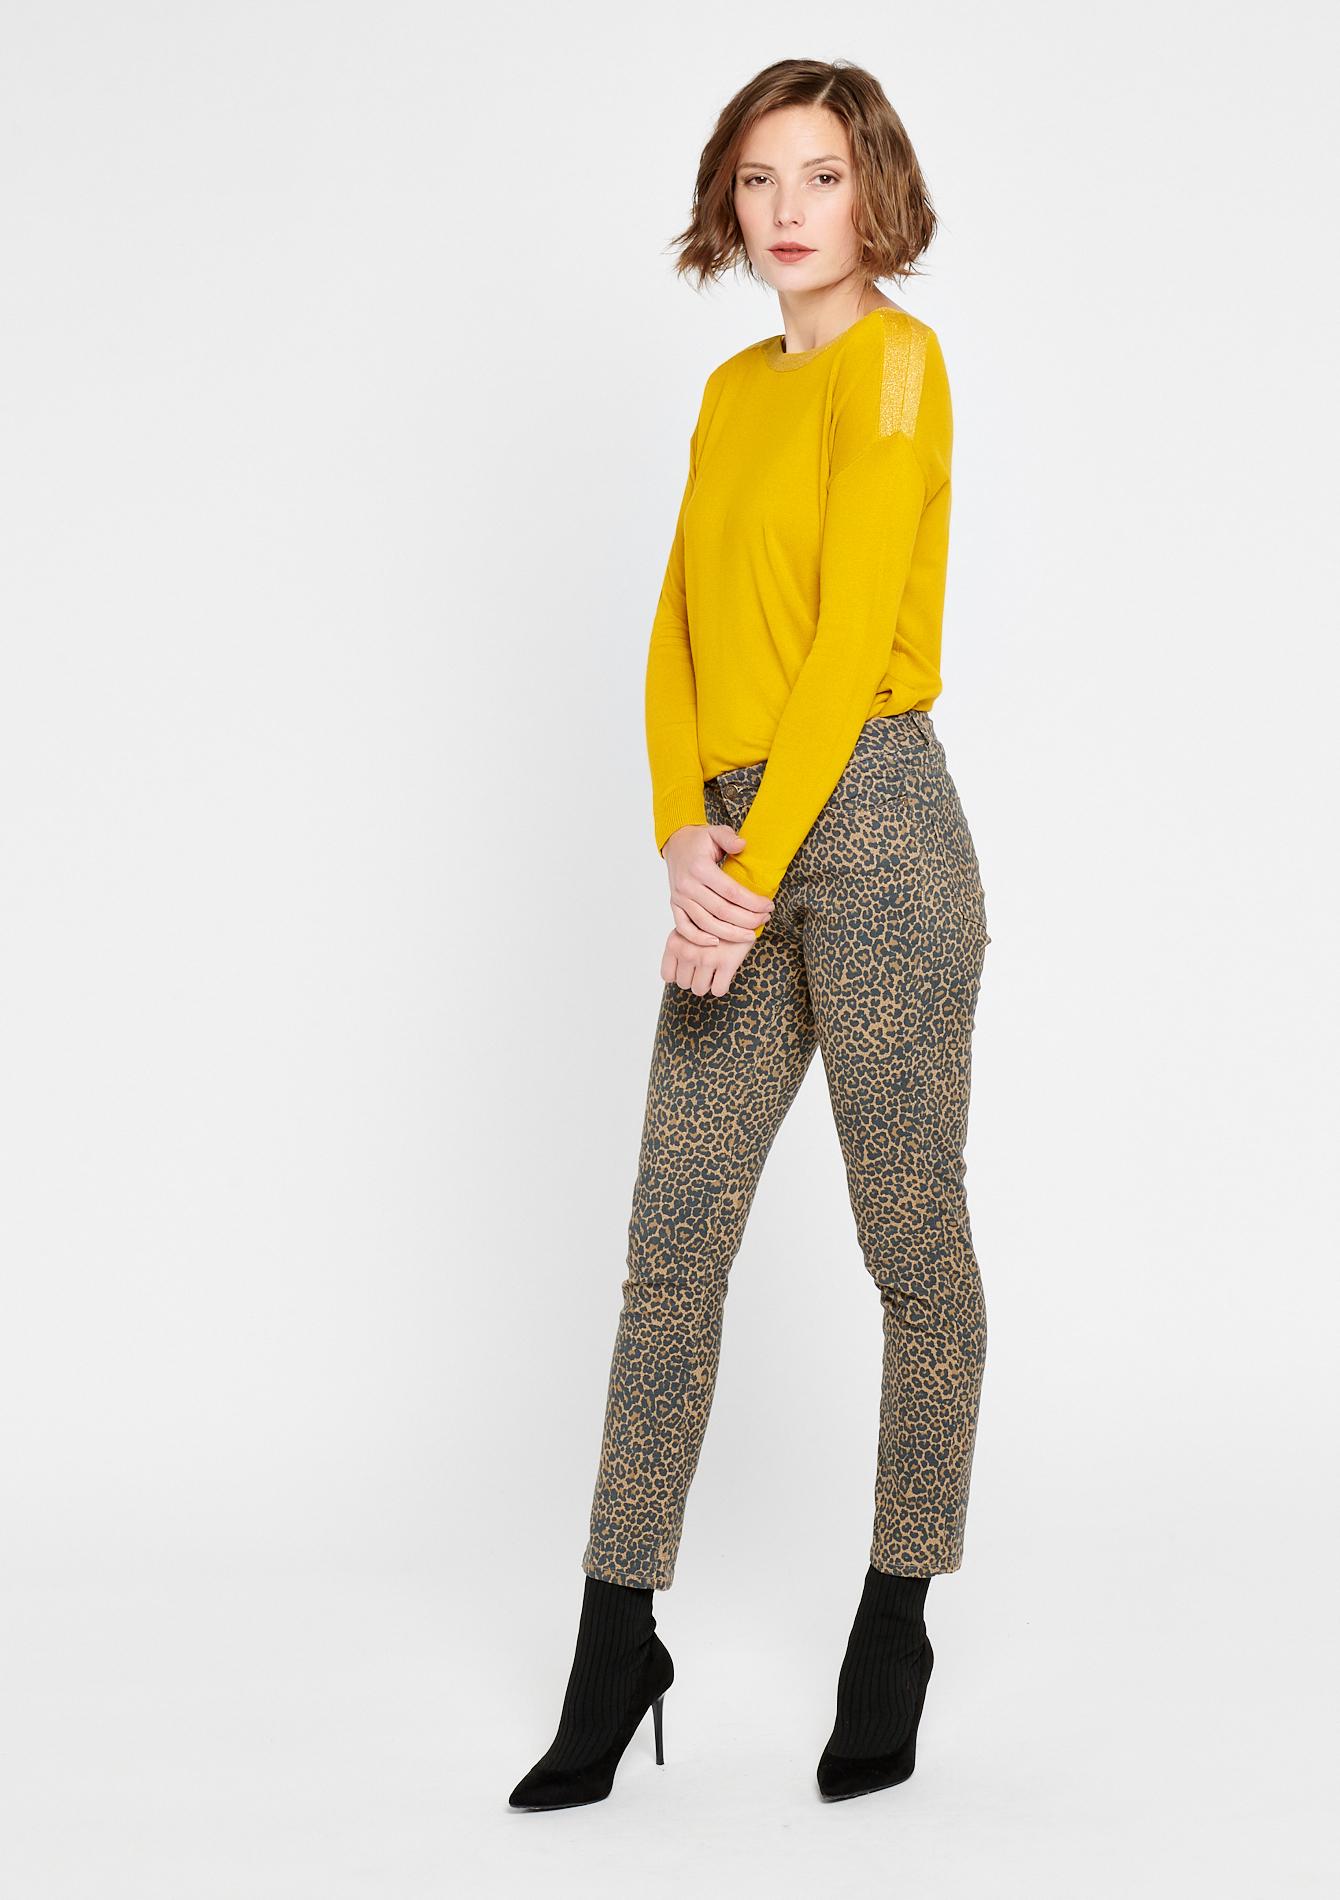 Pantalon imprimé léopard - BEIGE OAK - 930027